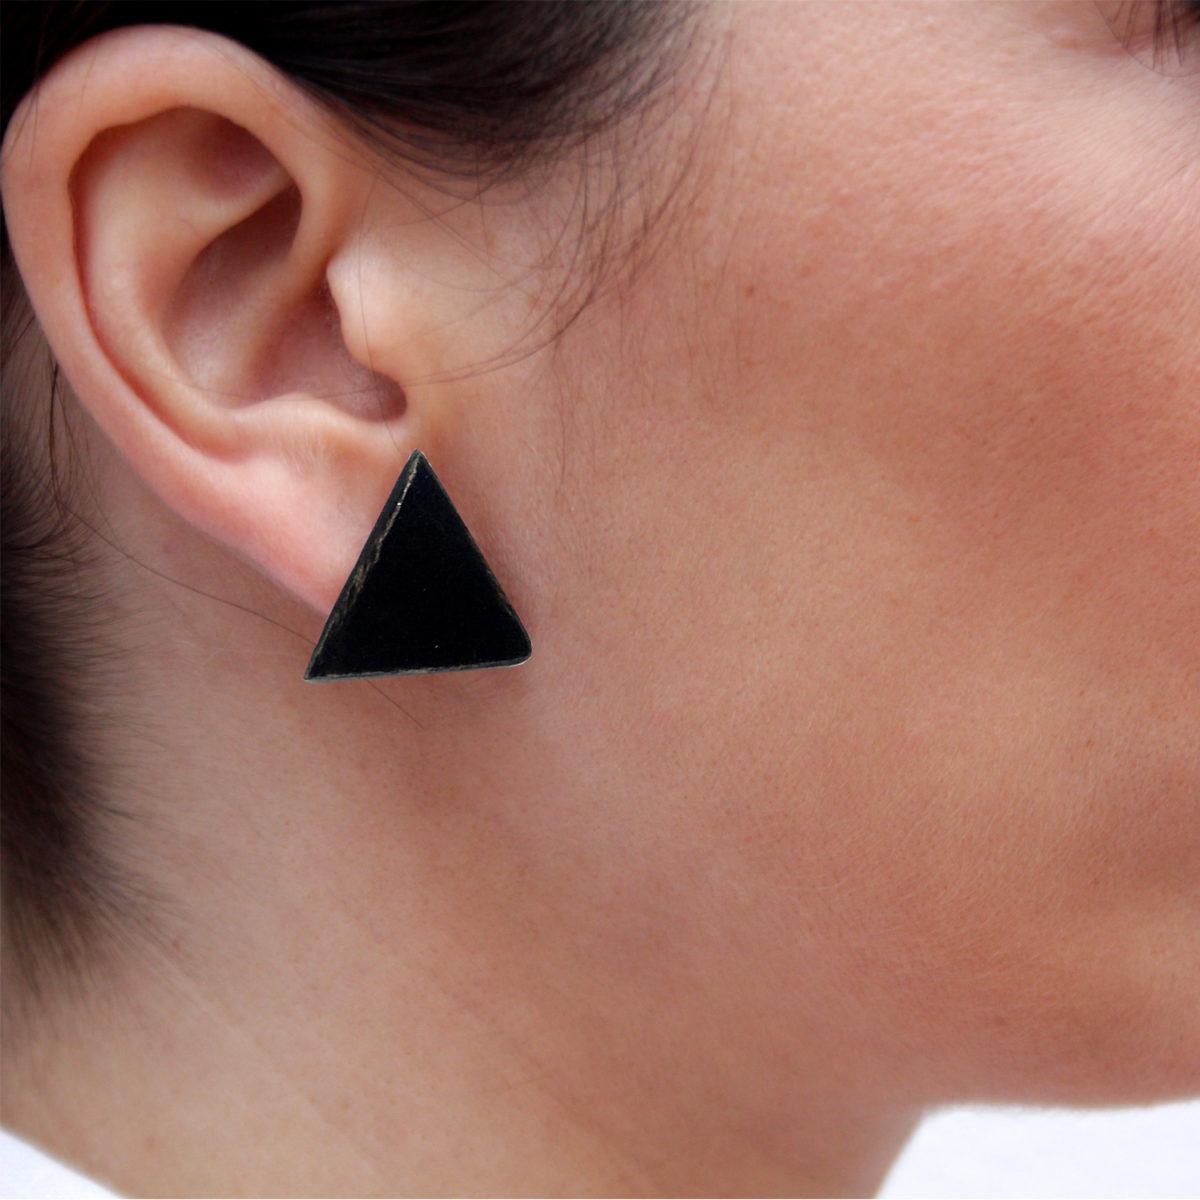 Pendientes de cerámica triangulares hechos a mano color negro Bowtery minimalista. Minimalist handmade ceramic triangle earrings black